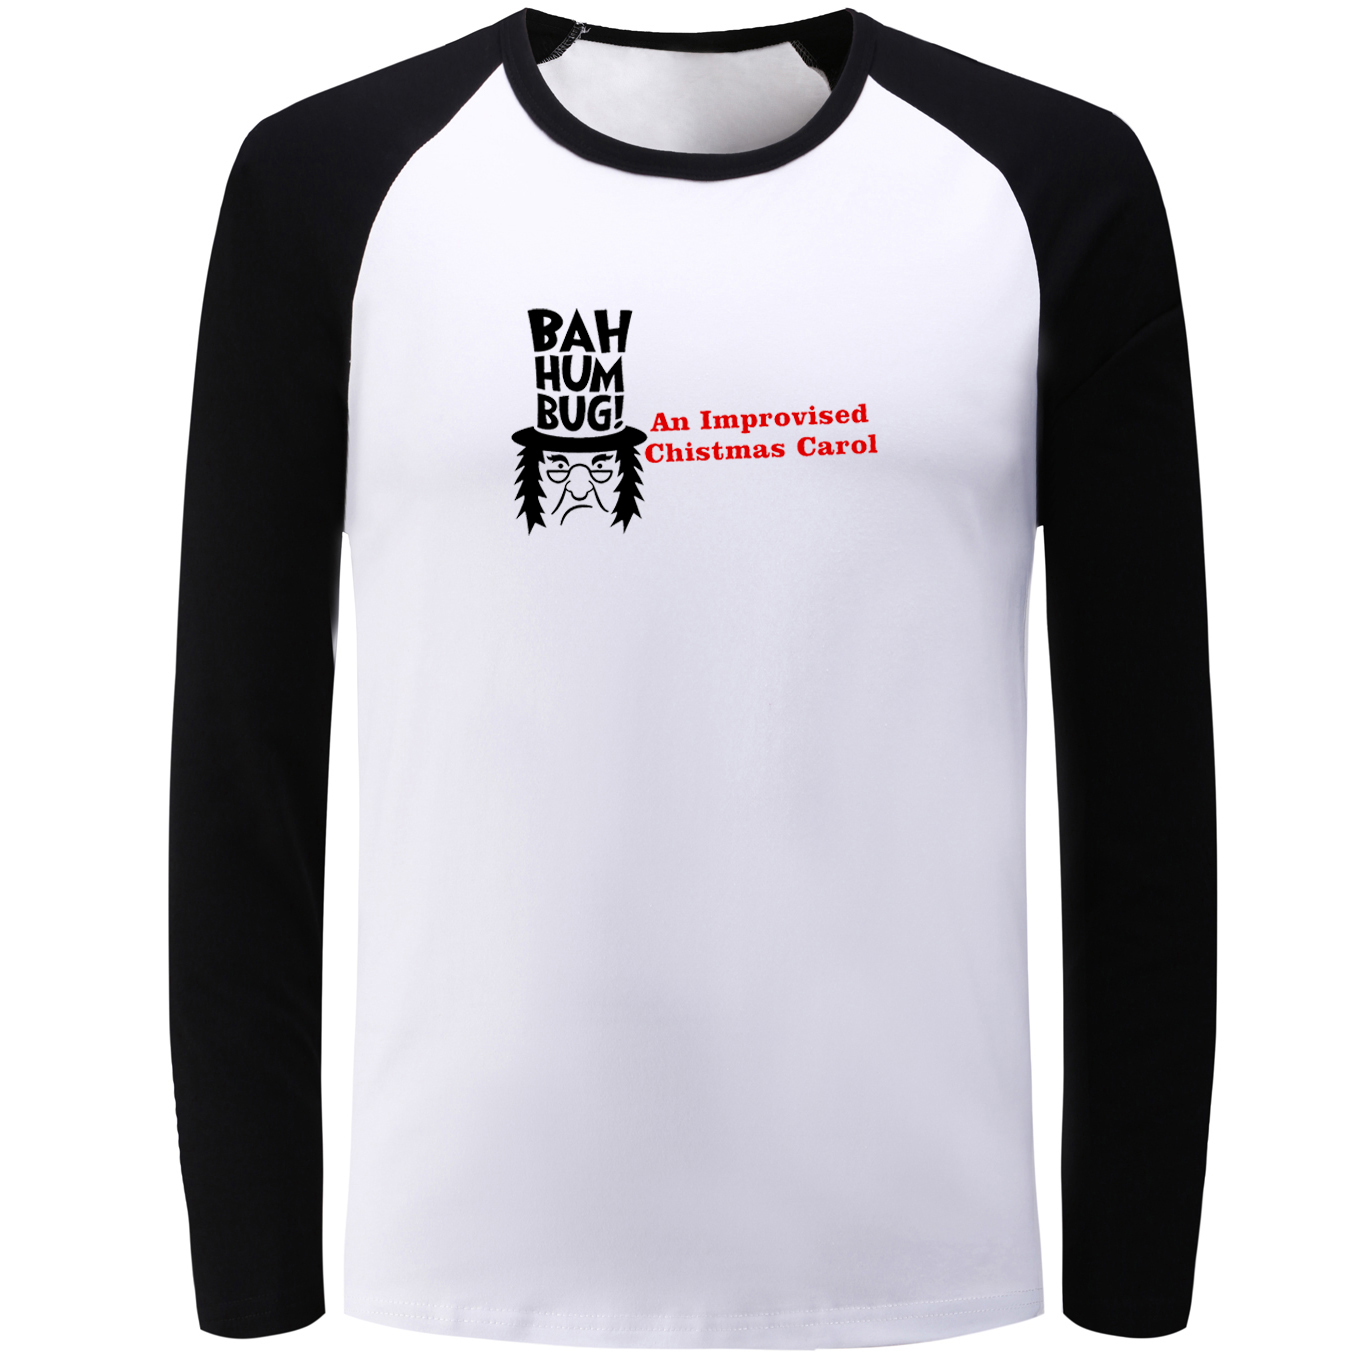 Idzn Мода реглан футболка с длинными рукавами Бах Вздор импровизированный Рождество Кэро ...